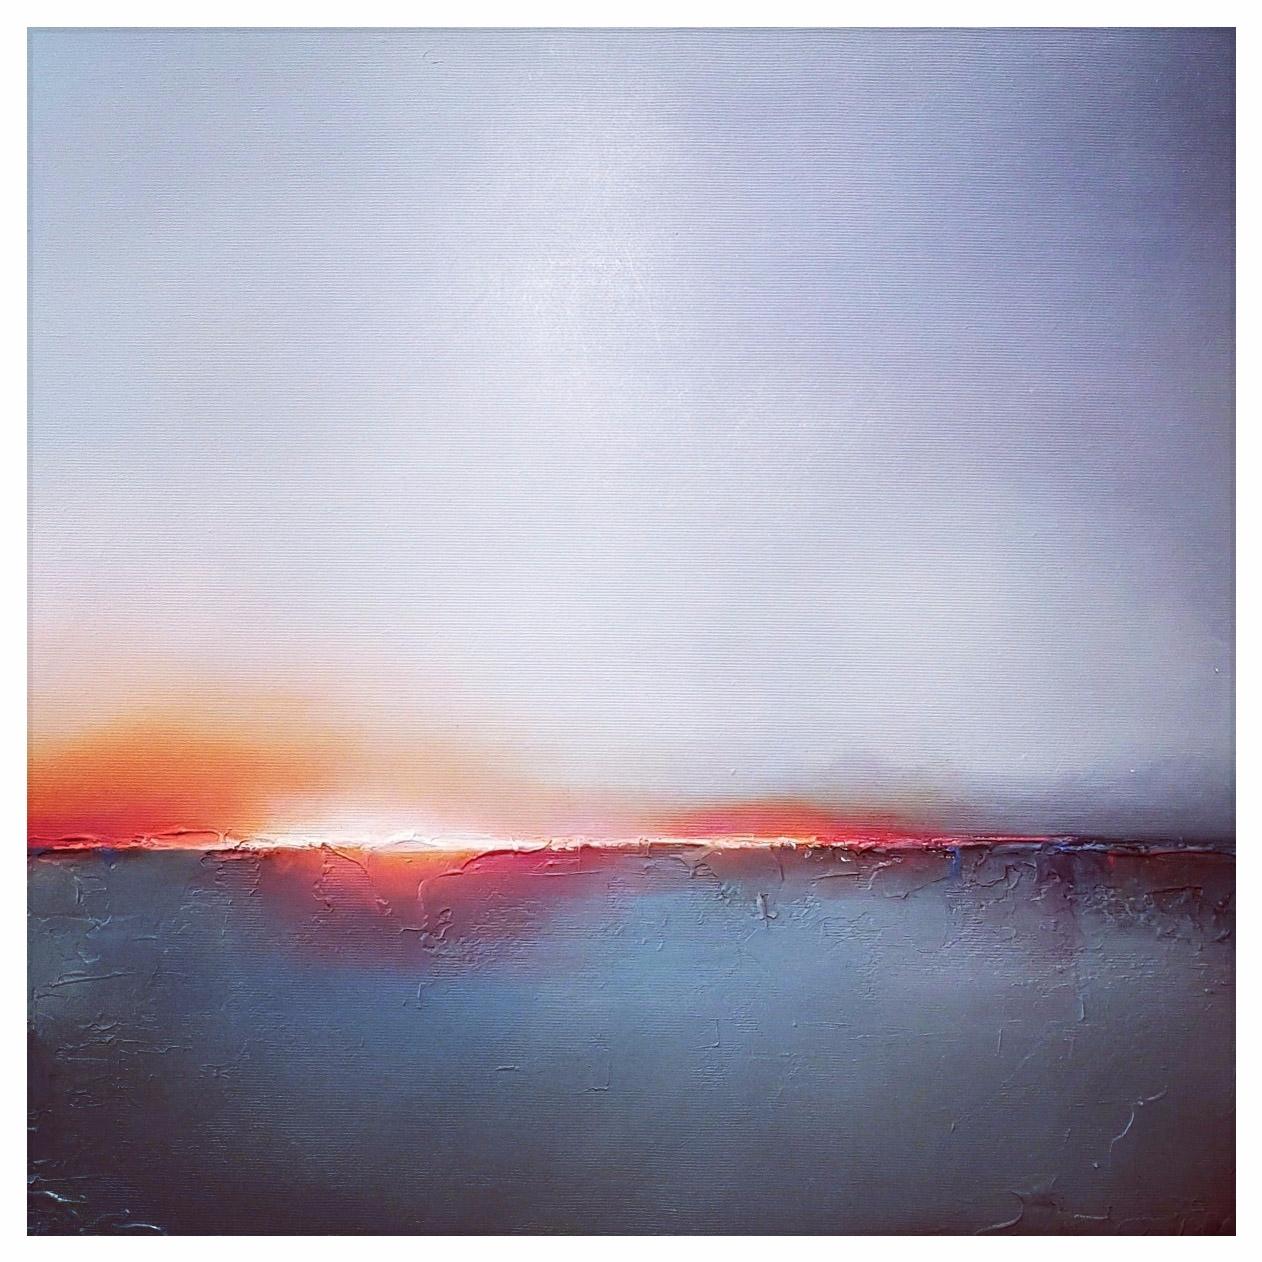 Sunset, 50 cm | Acrylic Mixed T - kim938 | ello